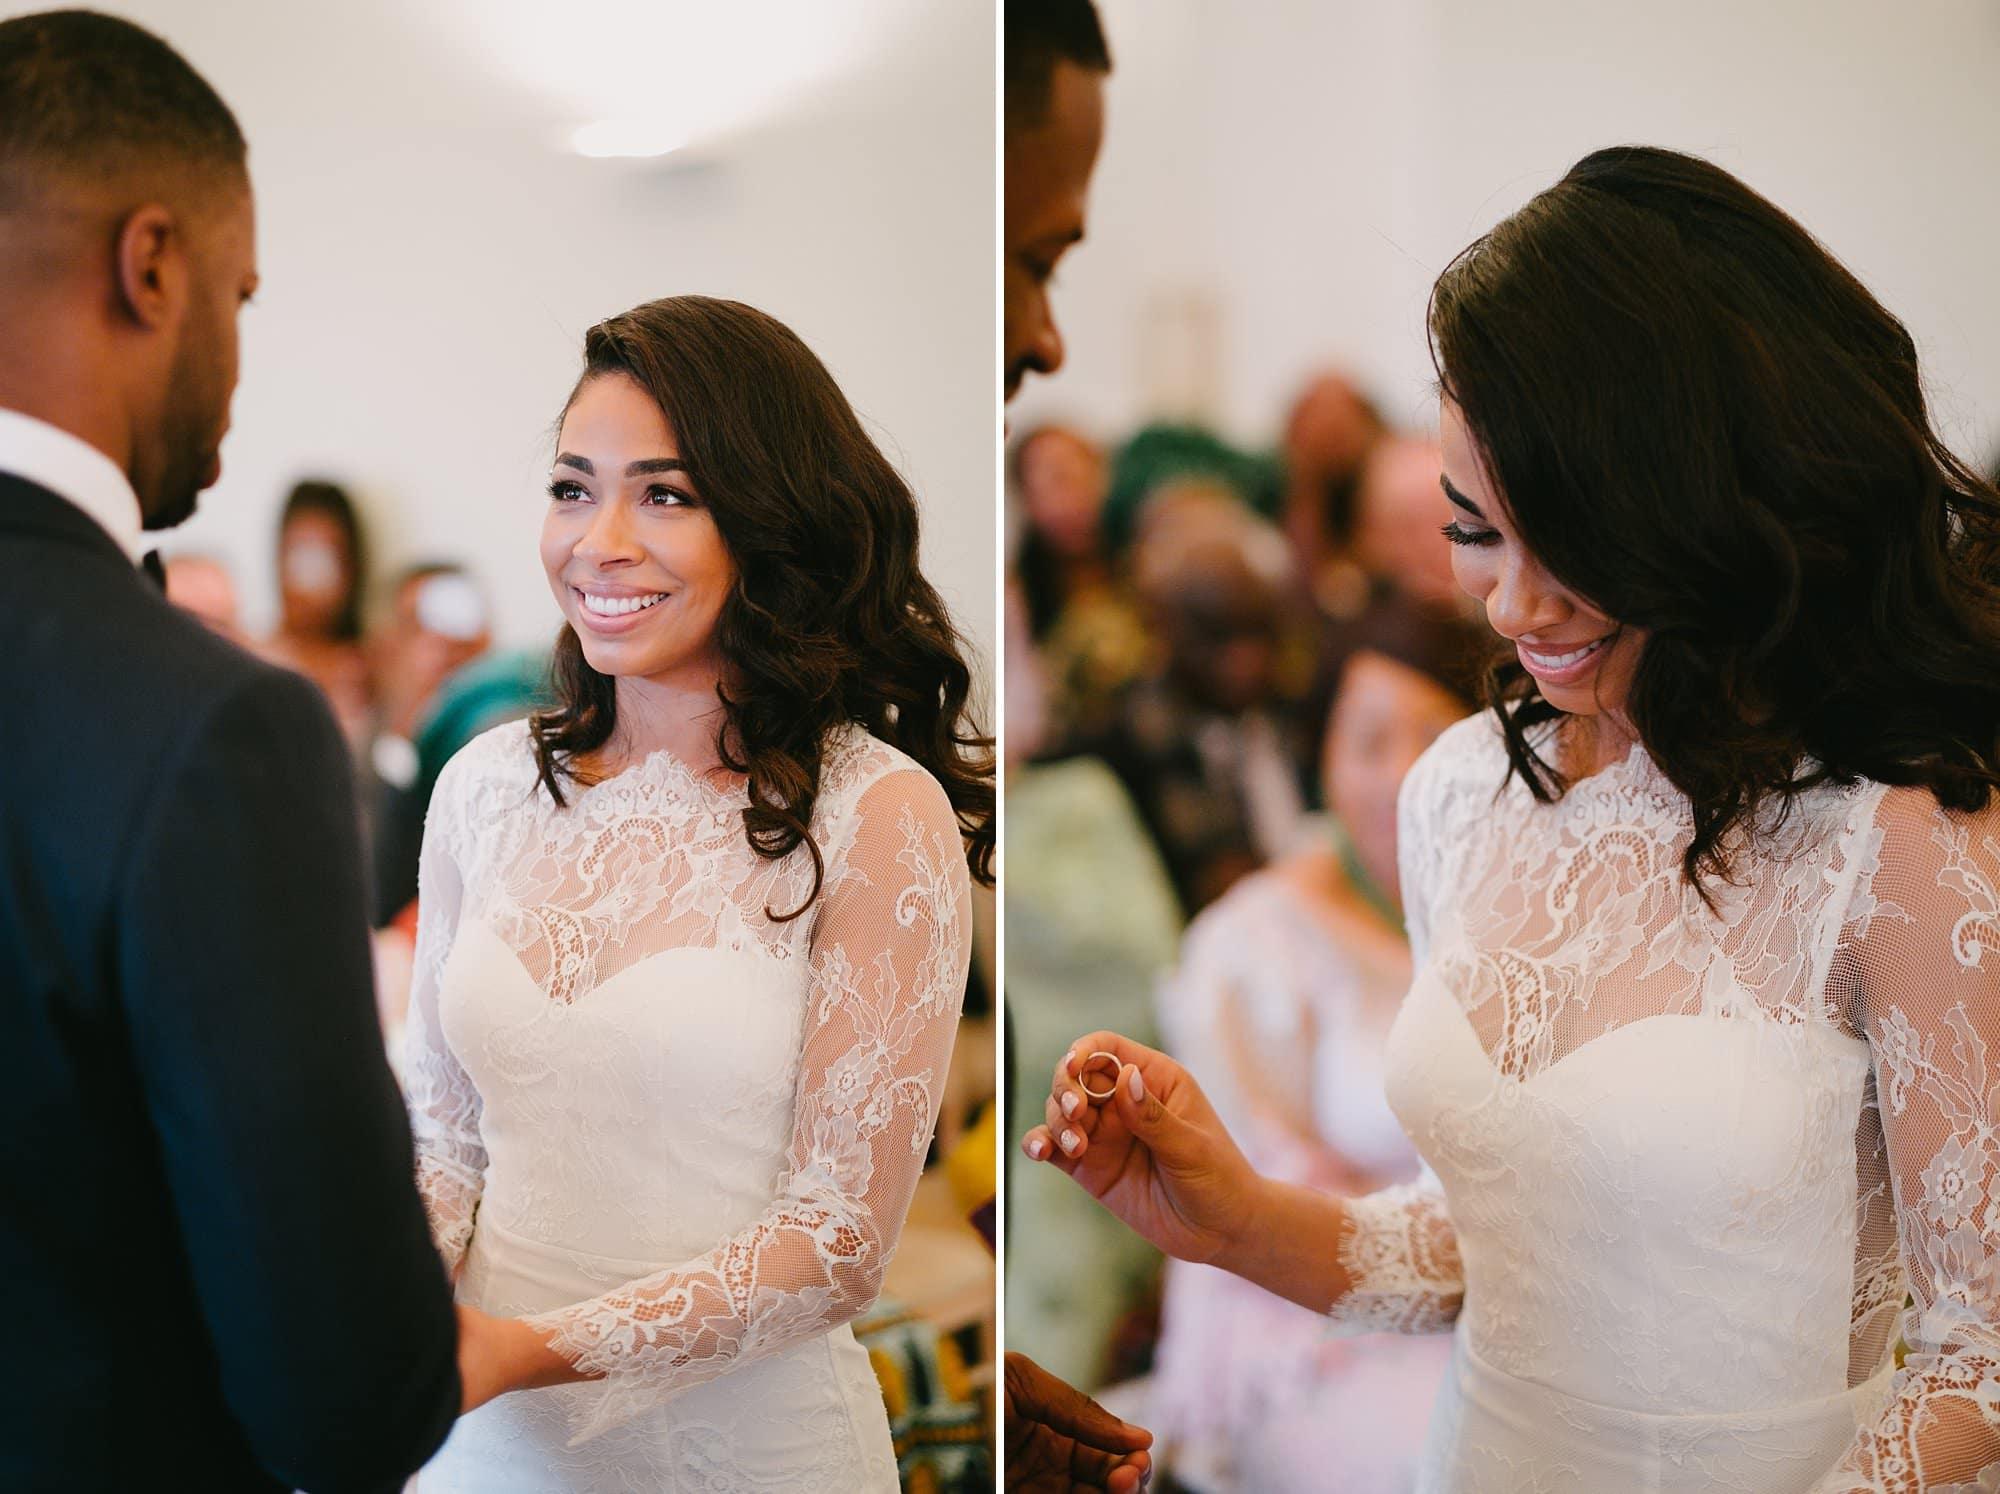 asia house london wedding photographer 024 - Rachel + Gabriel   Asia House Wedding Photography